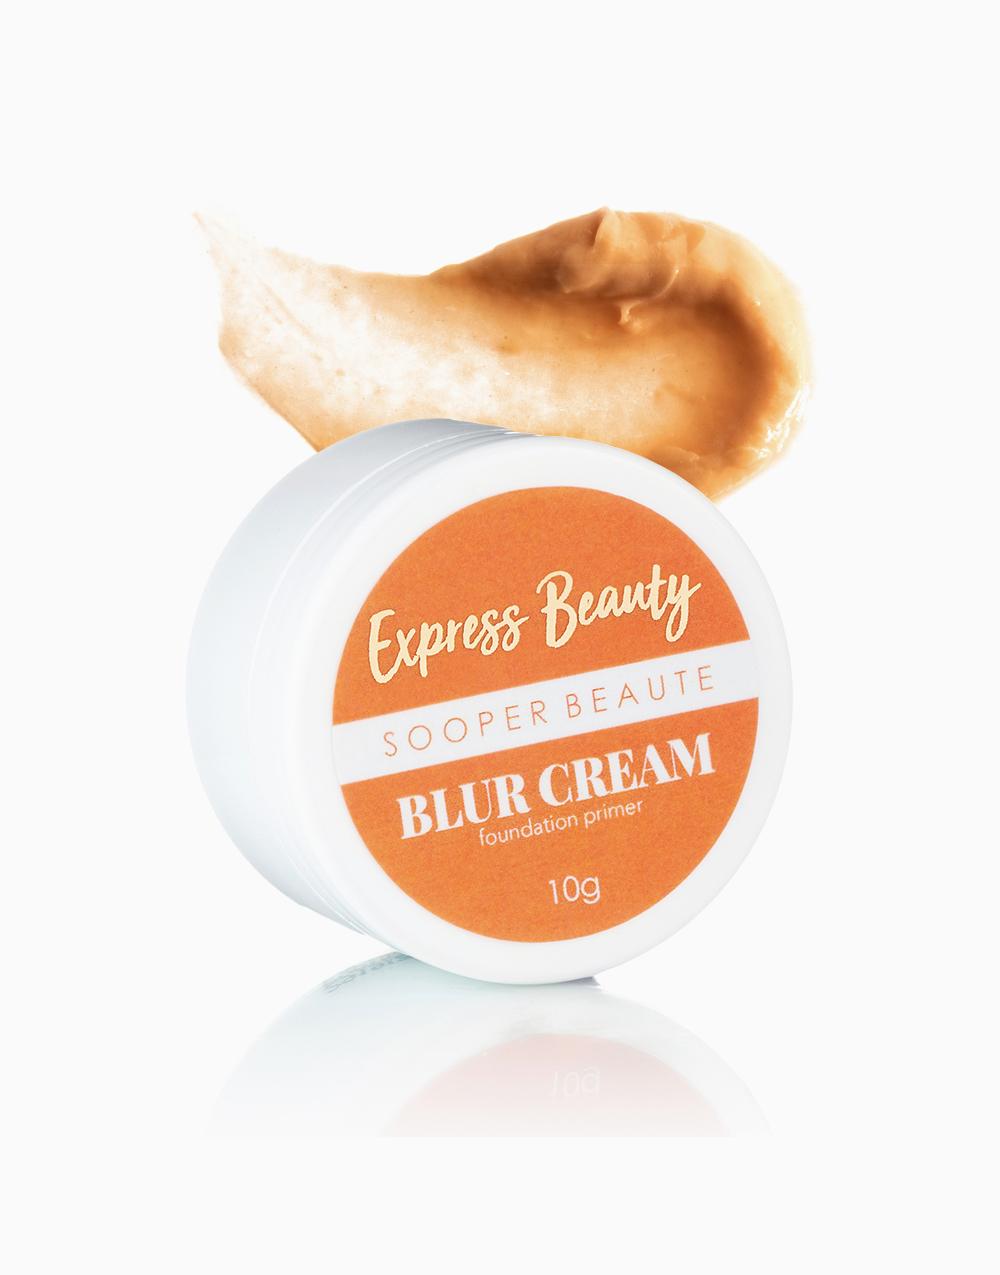 Express Beauty Blur Cream Primer Foundation 10g by Sooper Beaute